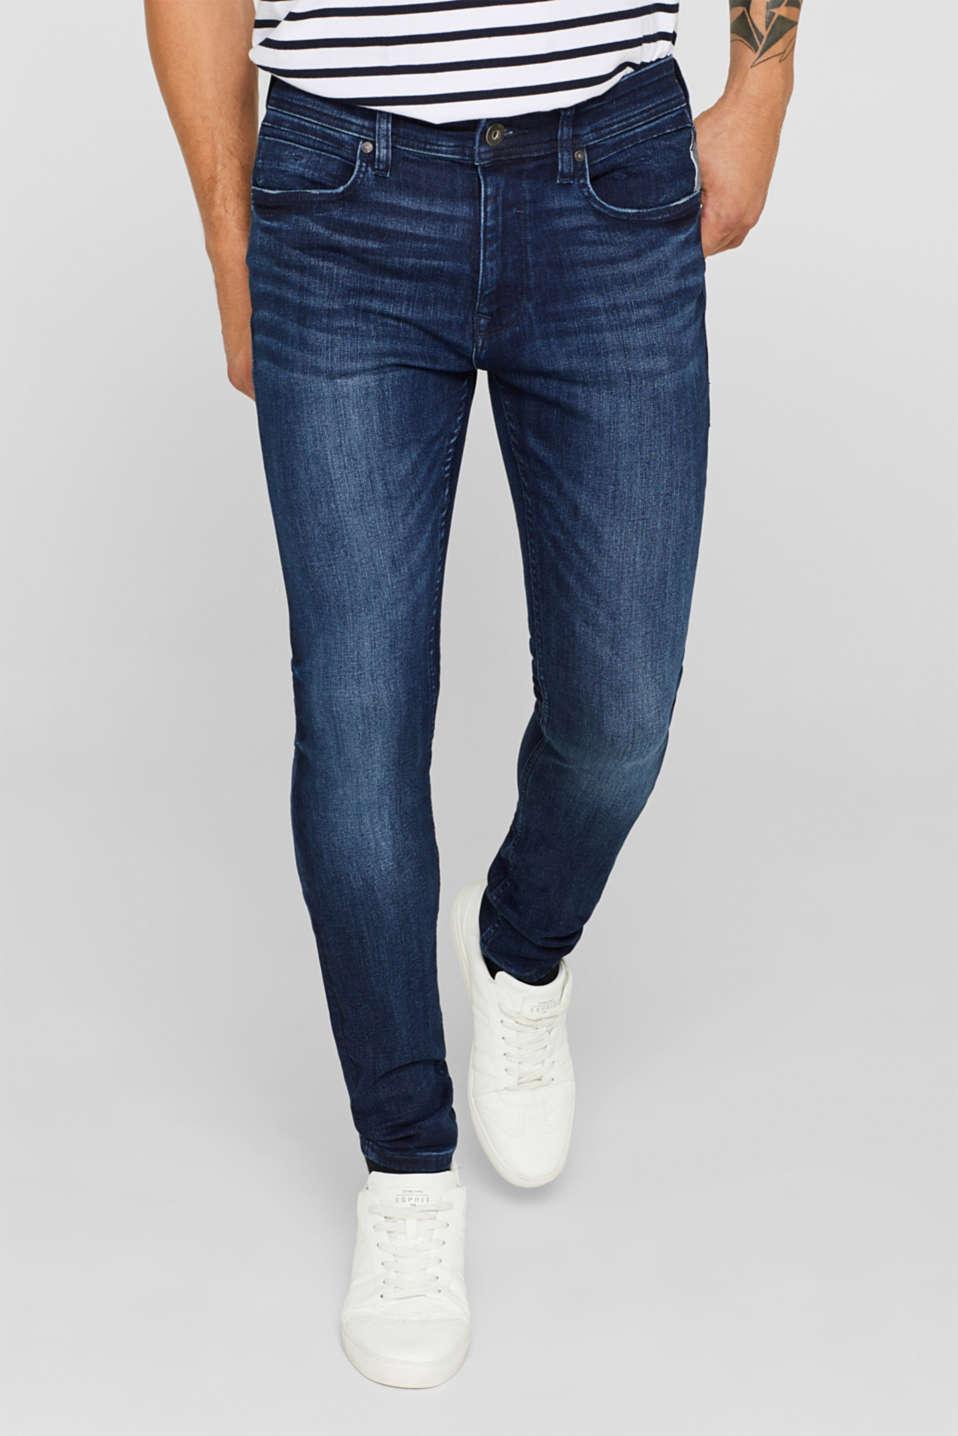 Pants denim, BLUE DARK WASH, detail image number 0